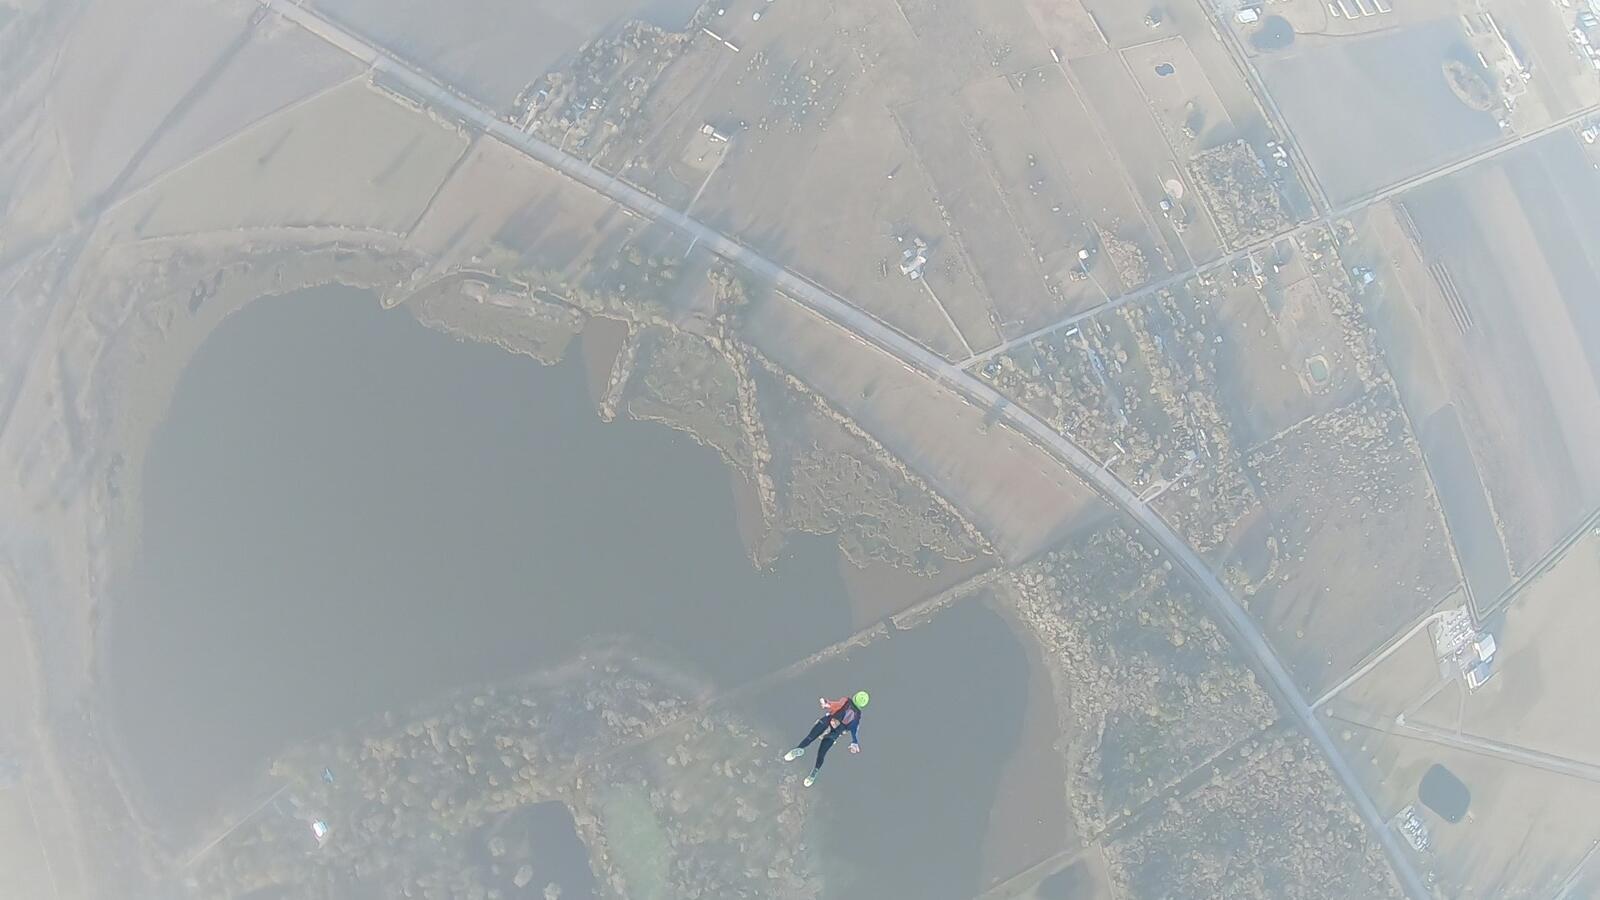 Falling Illini 3-way_Moment4.jpg